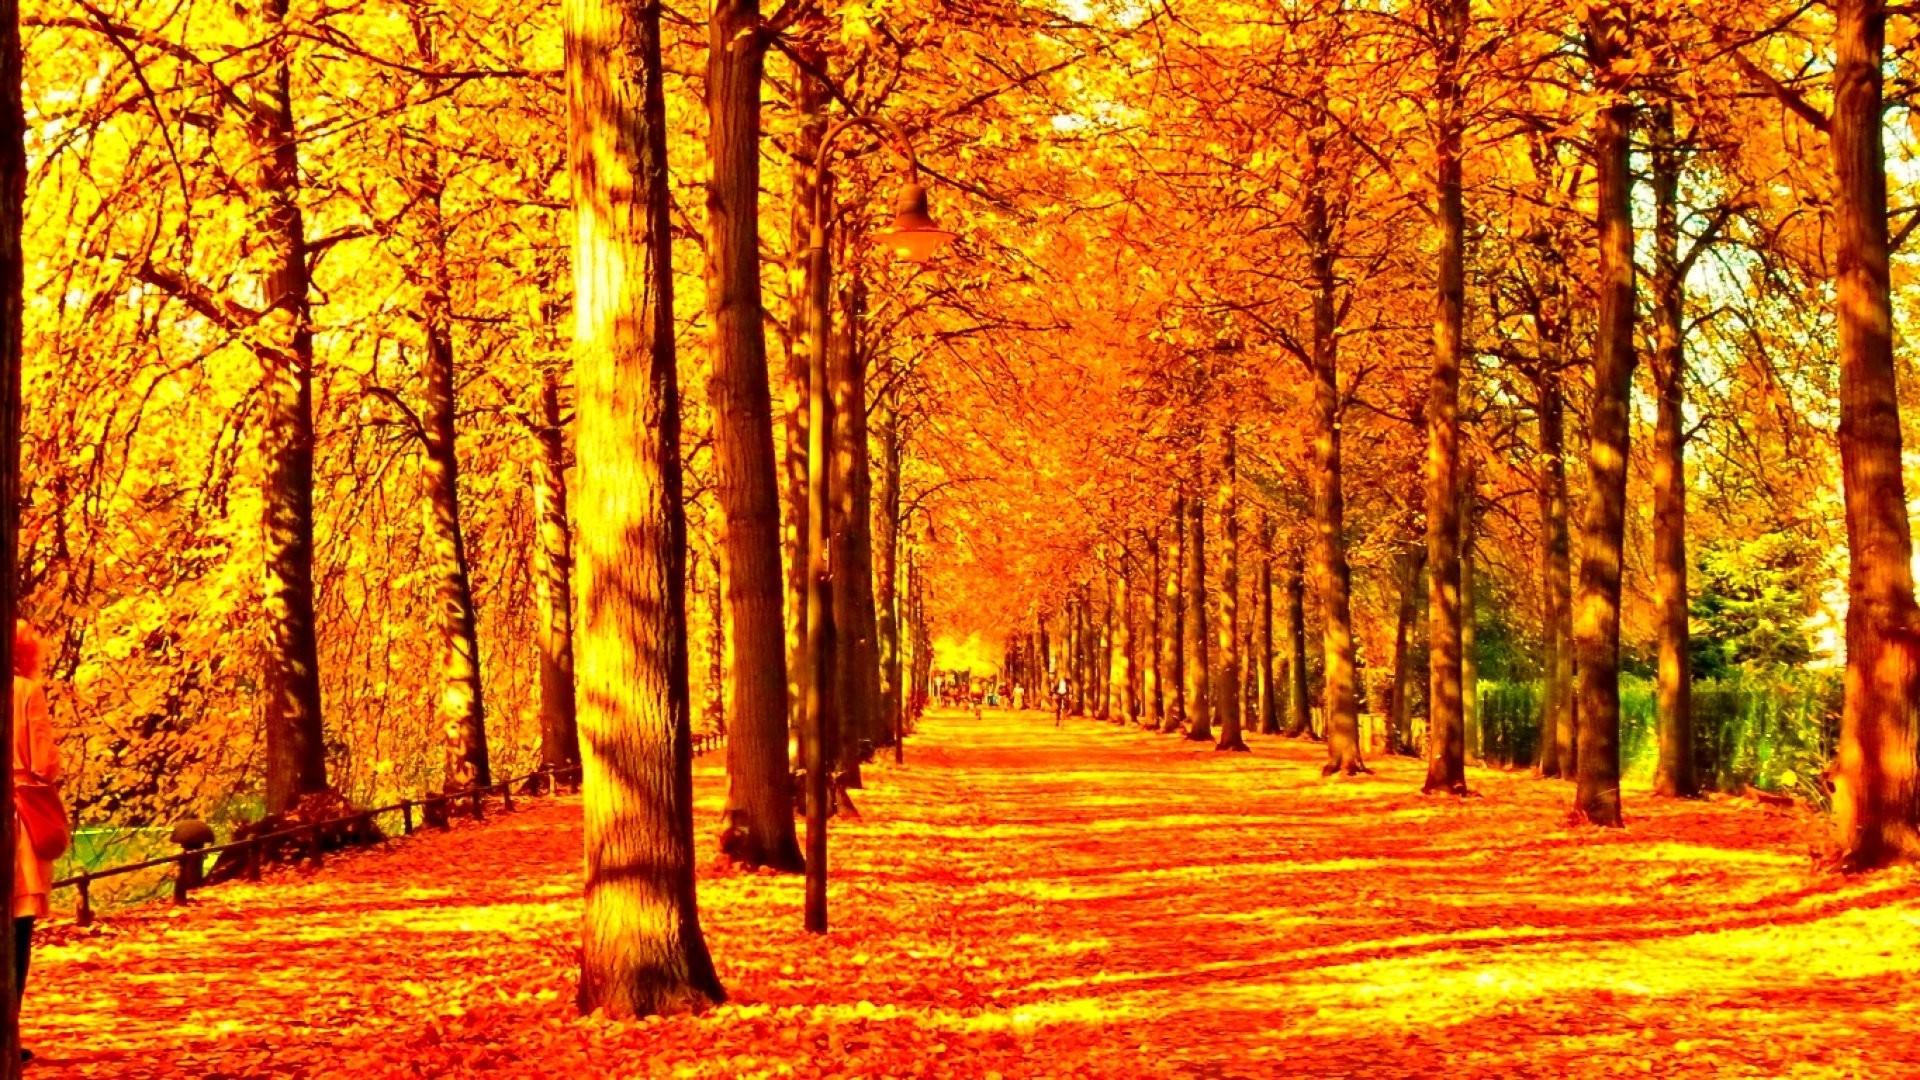 #991100 Color – Season Fall Seasons Landscape Nature Autumn Tree Leaves  Leaf Forest Color Nice